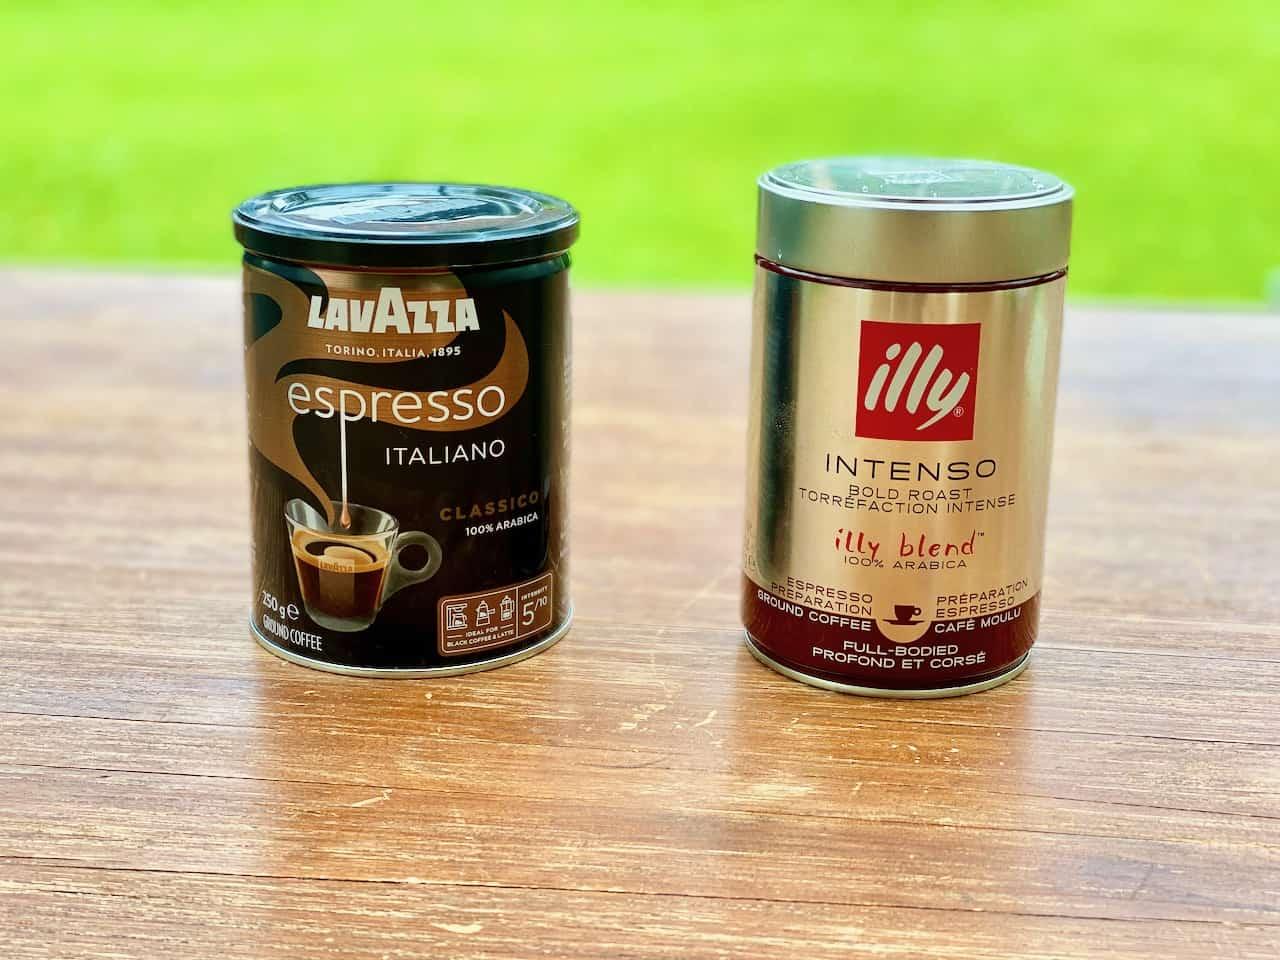 Camping-und-Kaffee-Lavazza-Classico-Illy-Intenso-aus-der-Bialetti